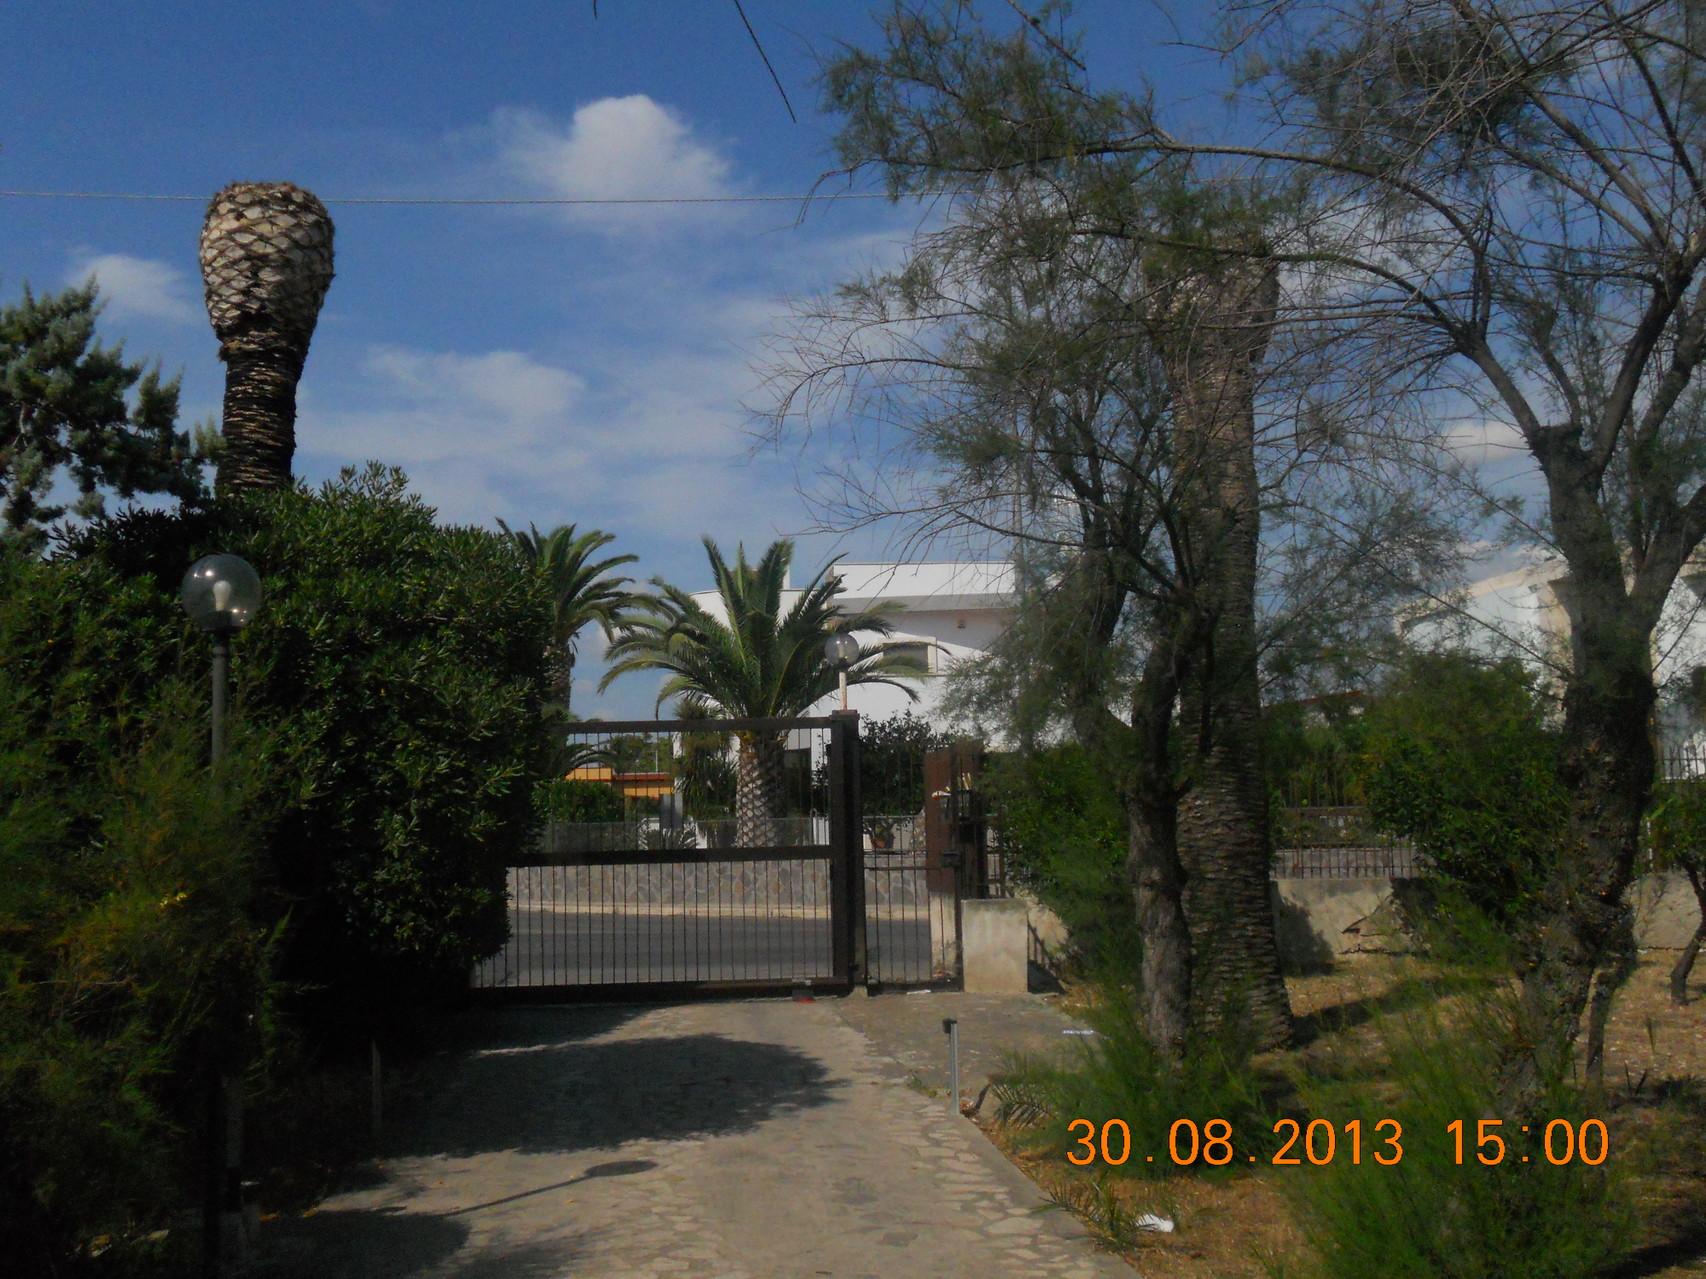 Viale d'entrata della villa